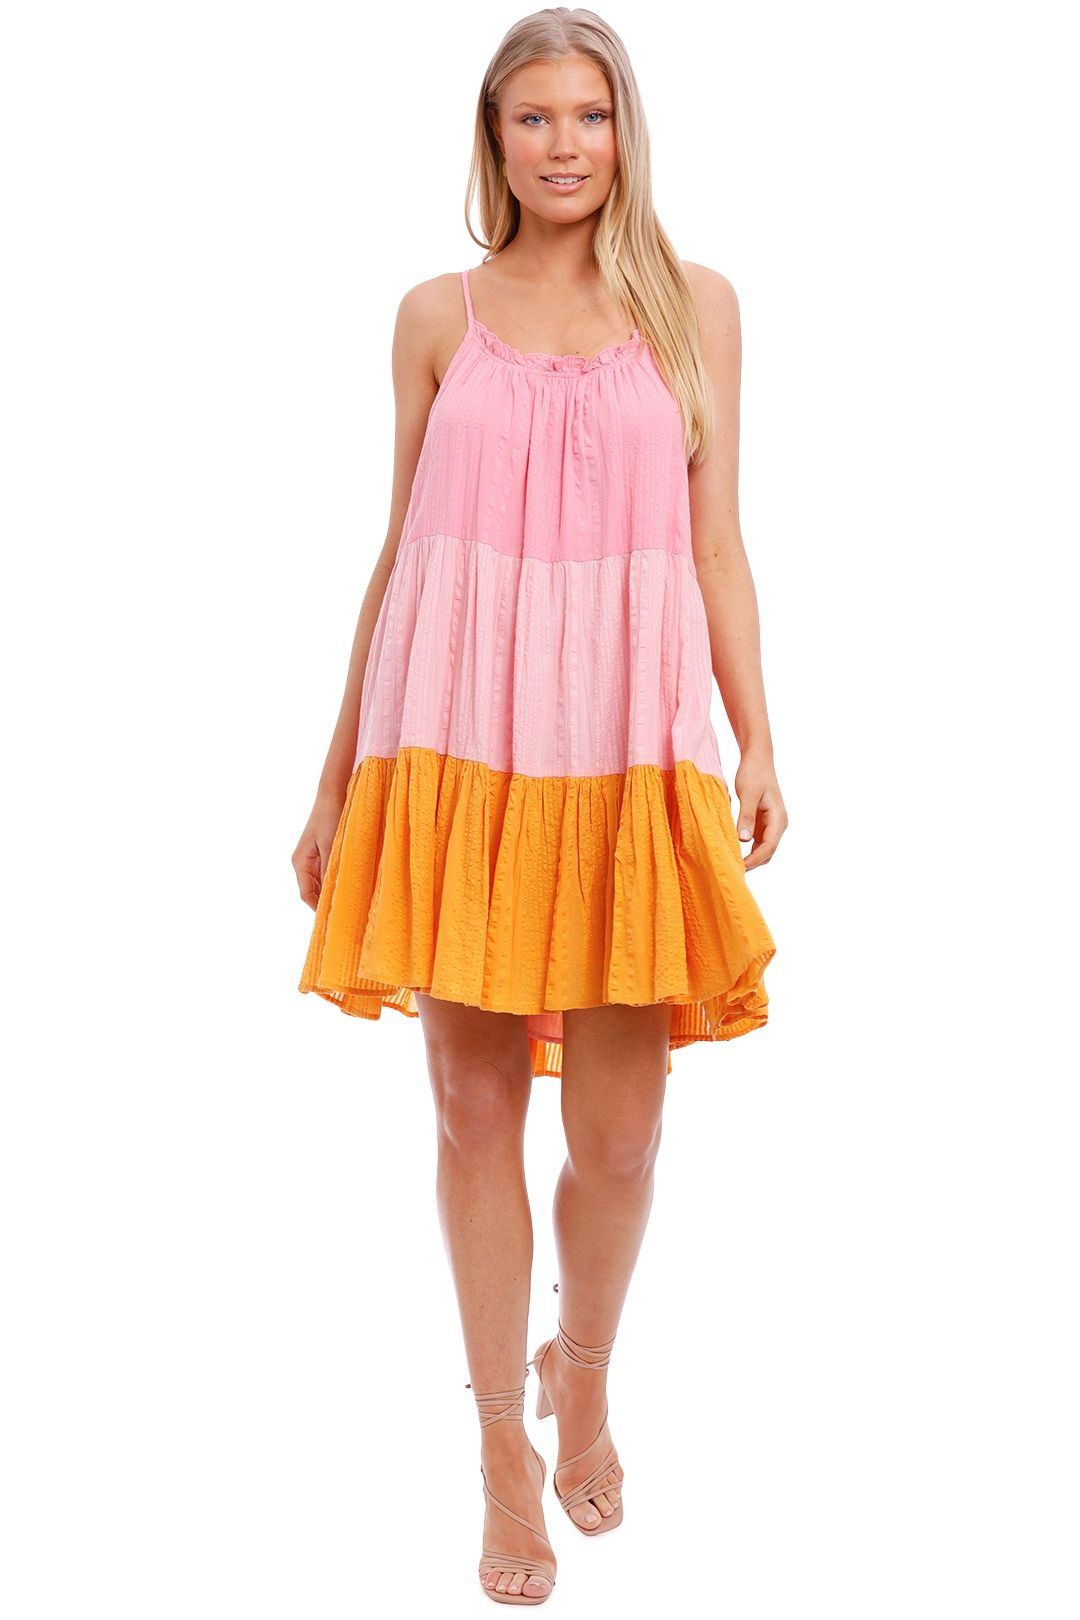 Steele Miami Dress mini